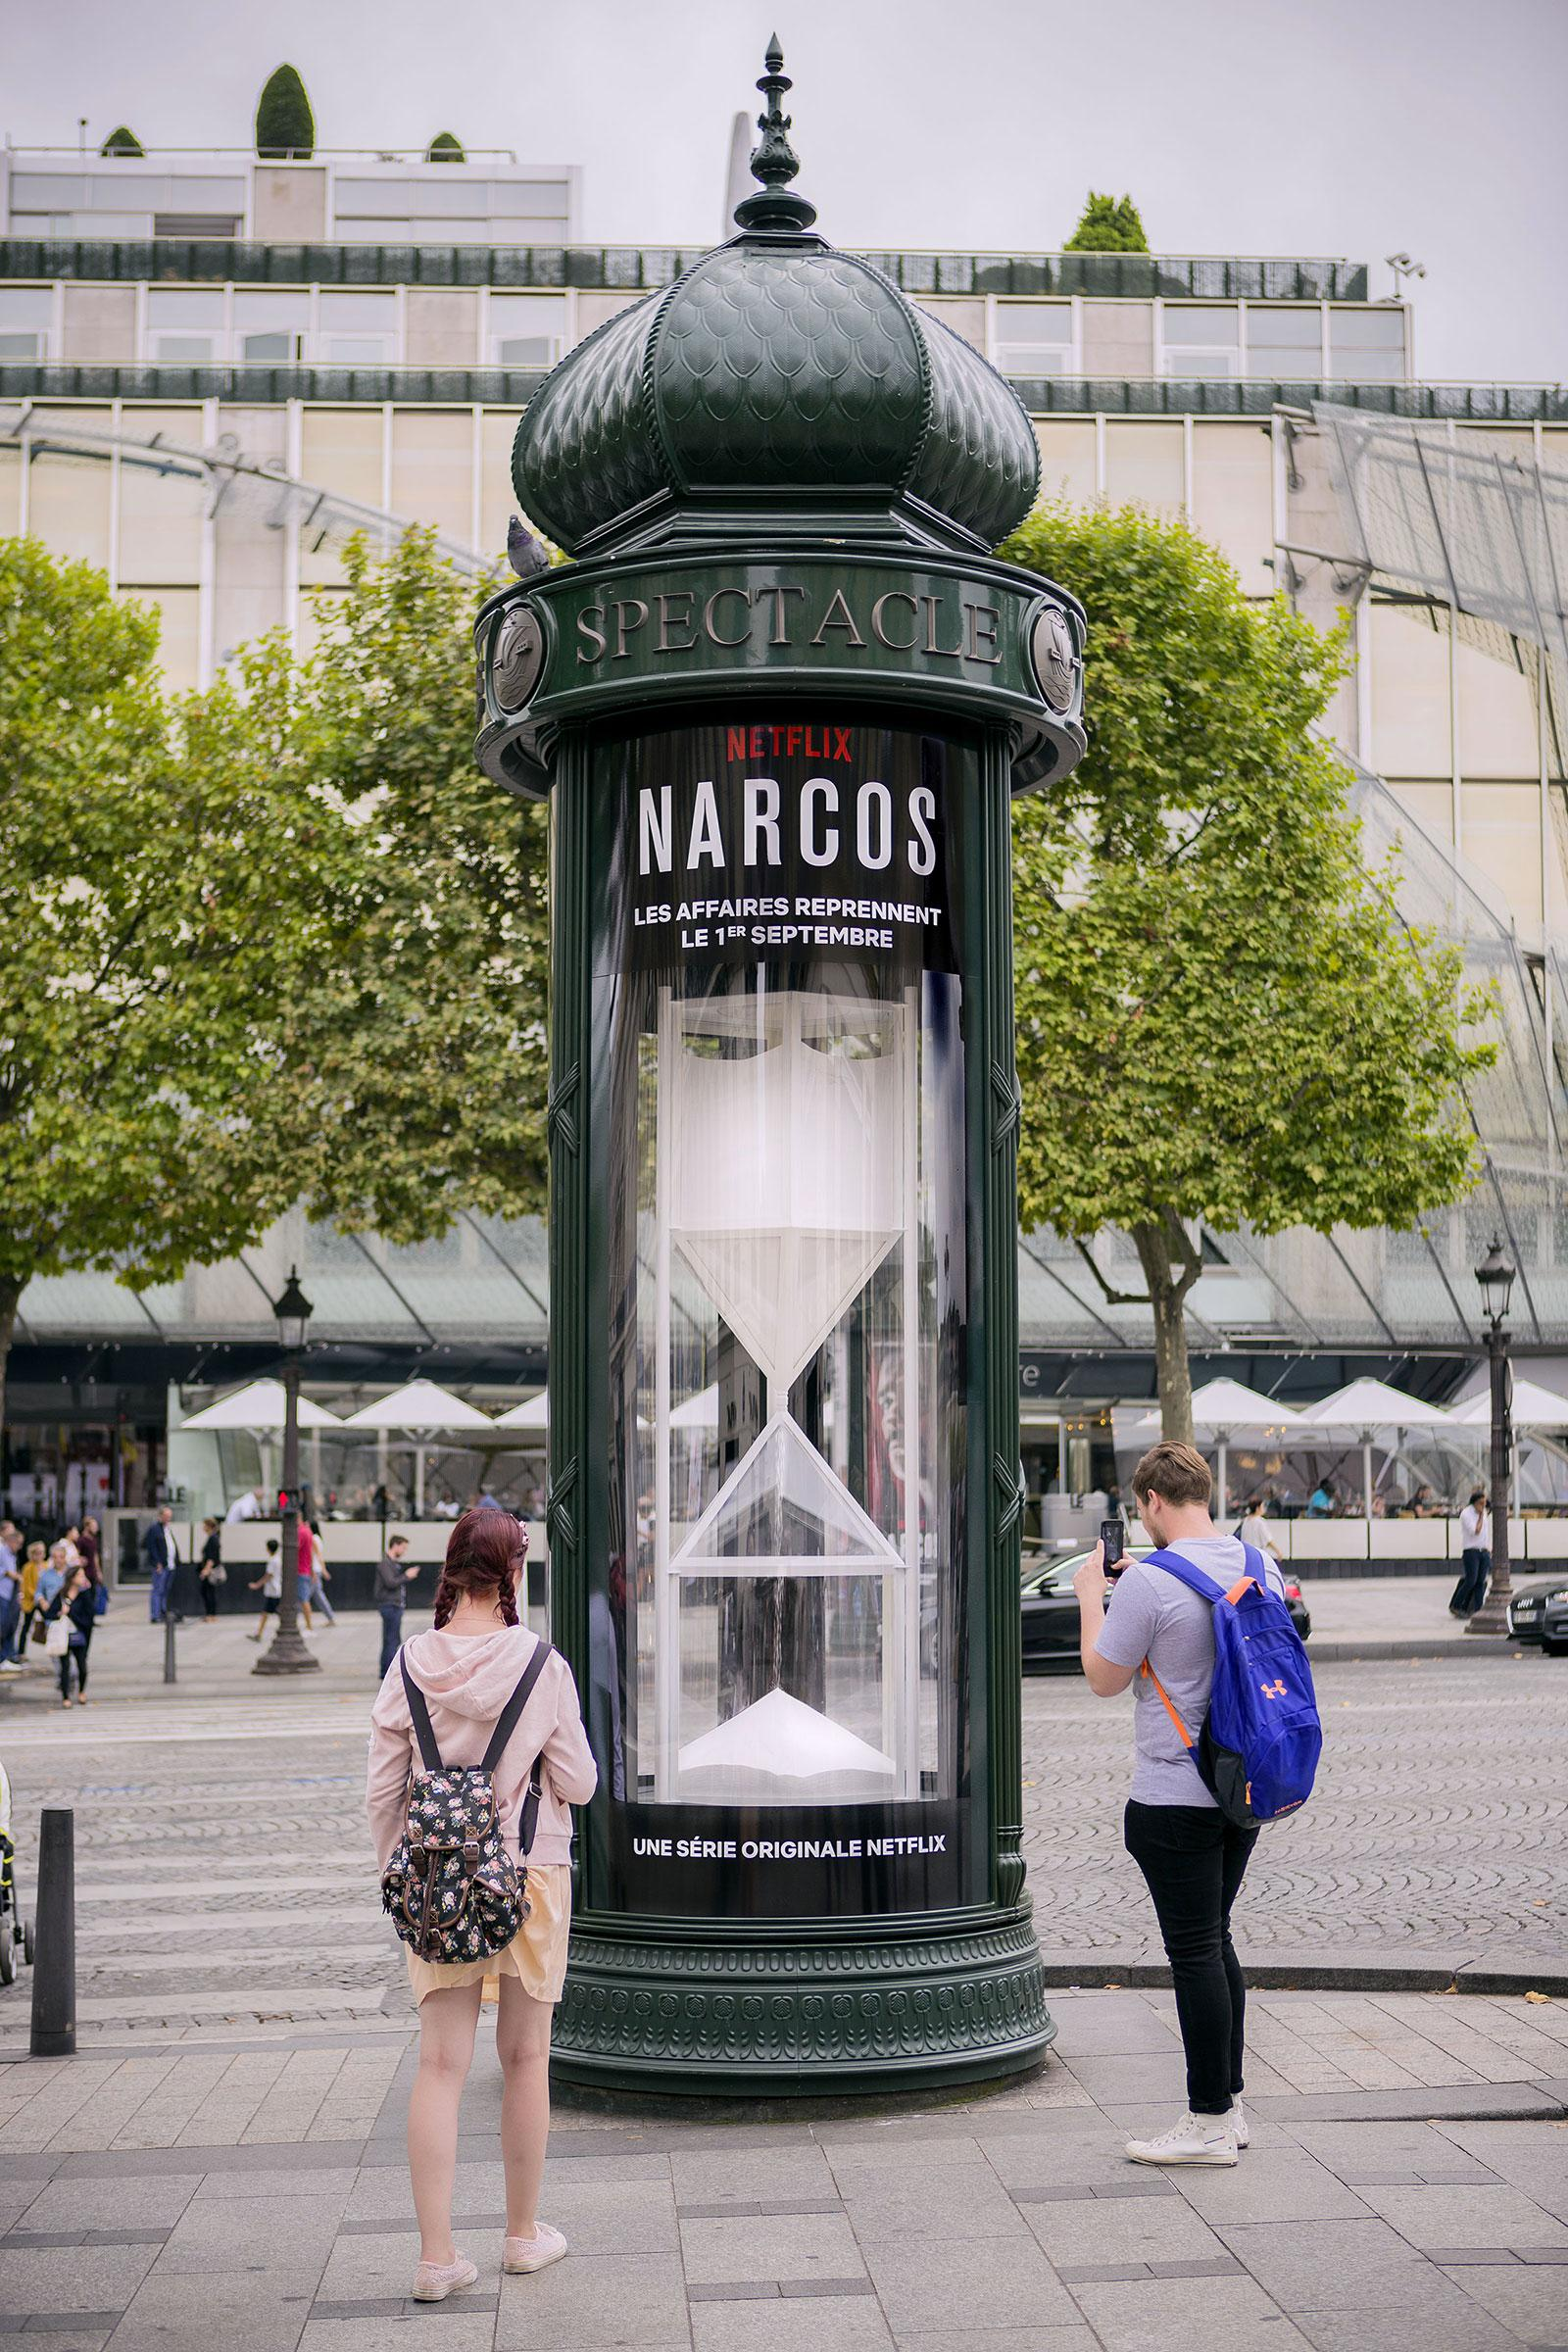 Netflix Outdoor Ad - Narcos Season 3 - The White Countdown